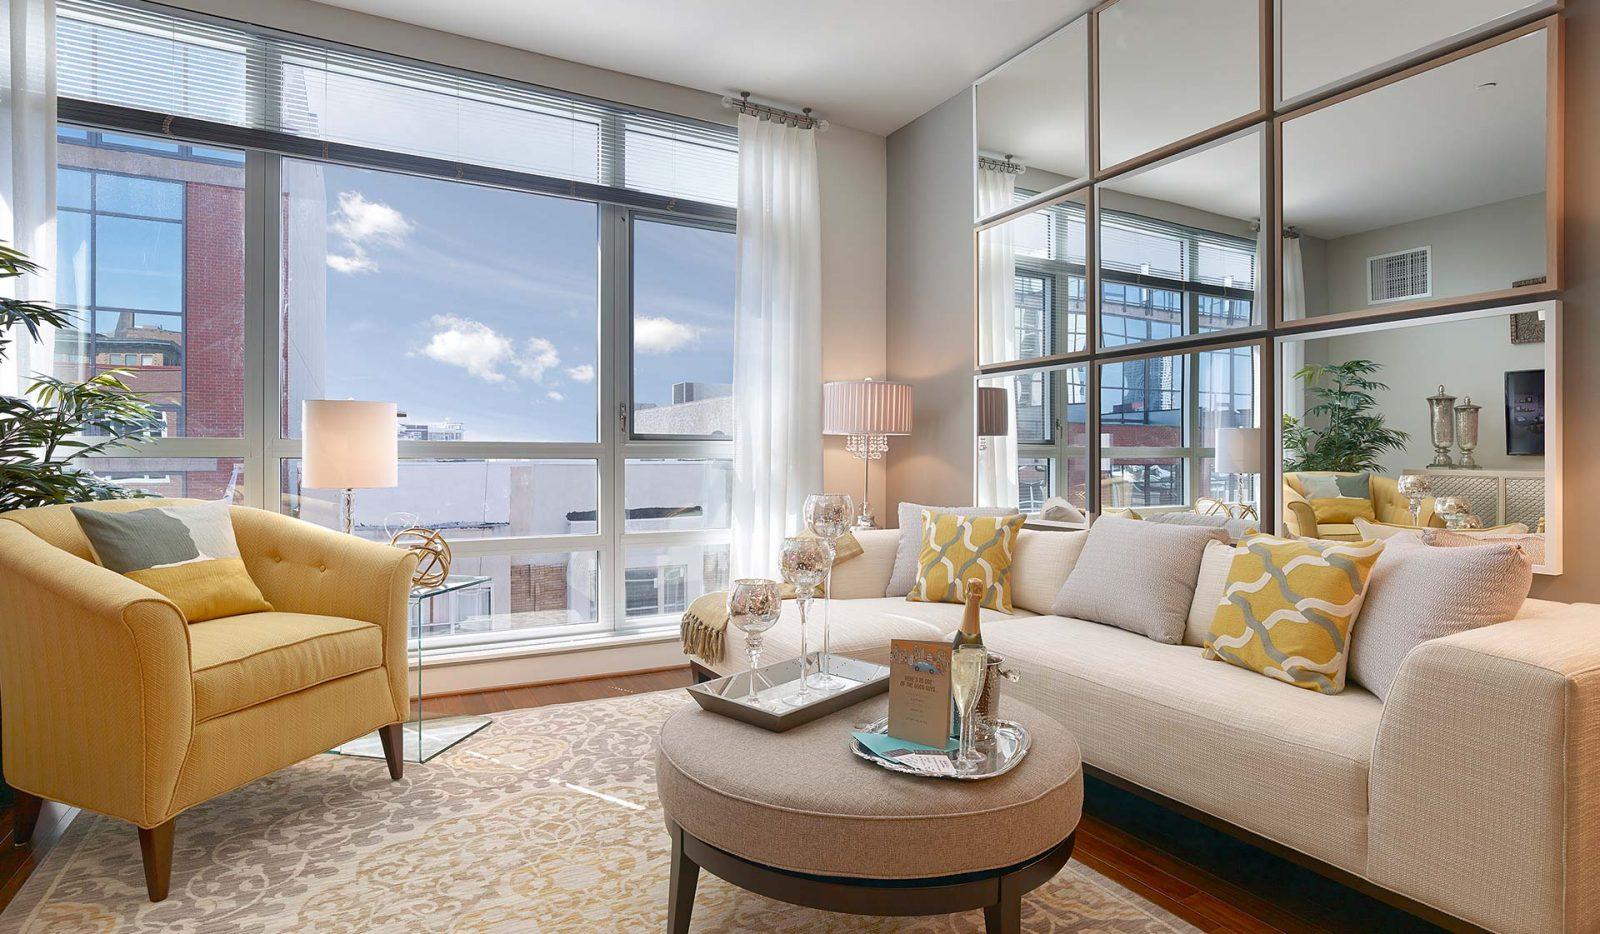 Southstar Lofts - Philadelphia Apartment & Condo Rentals ...